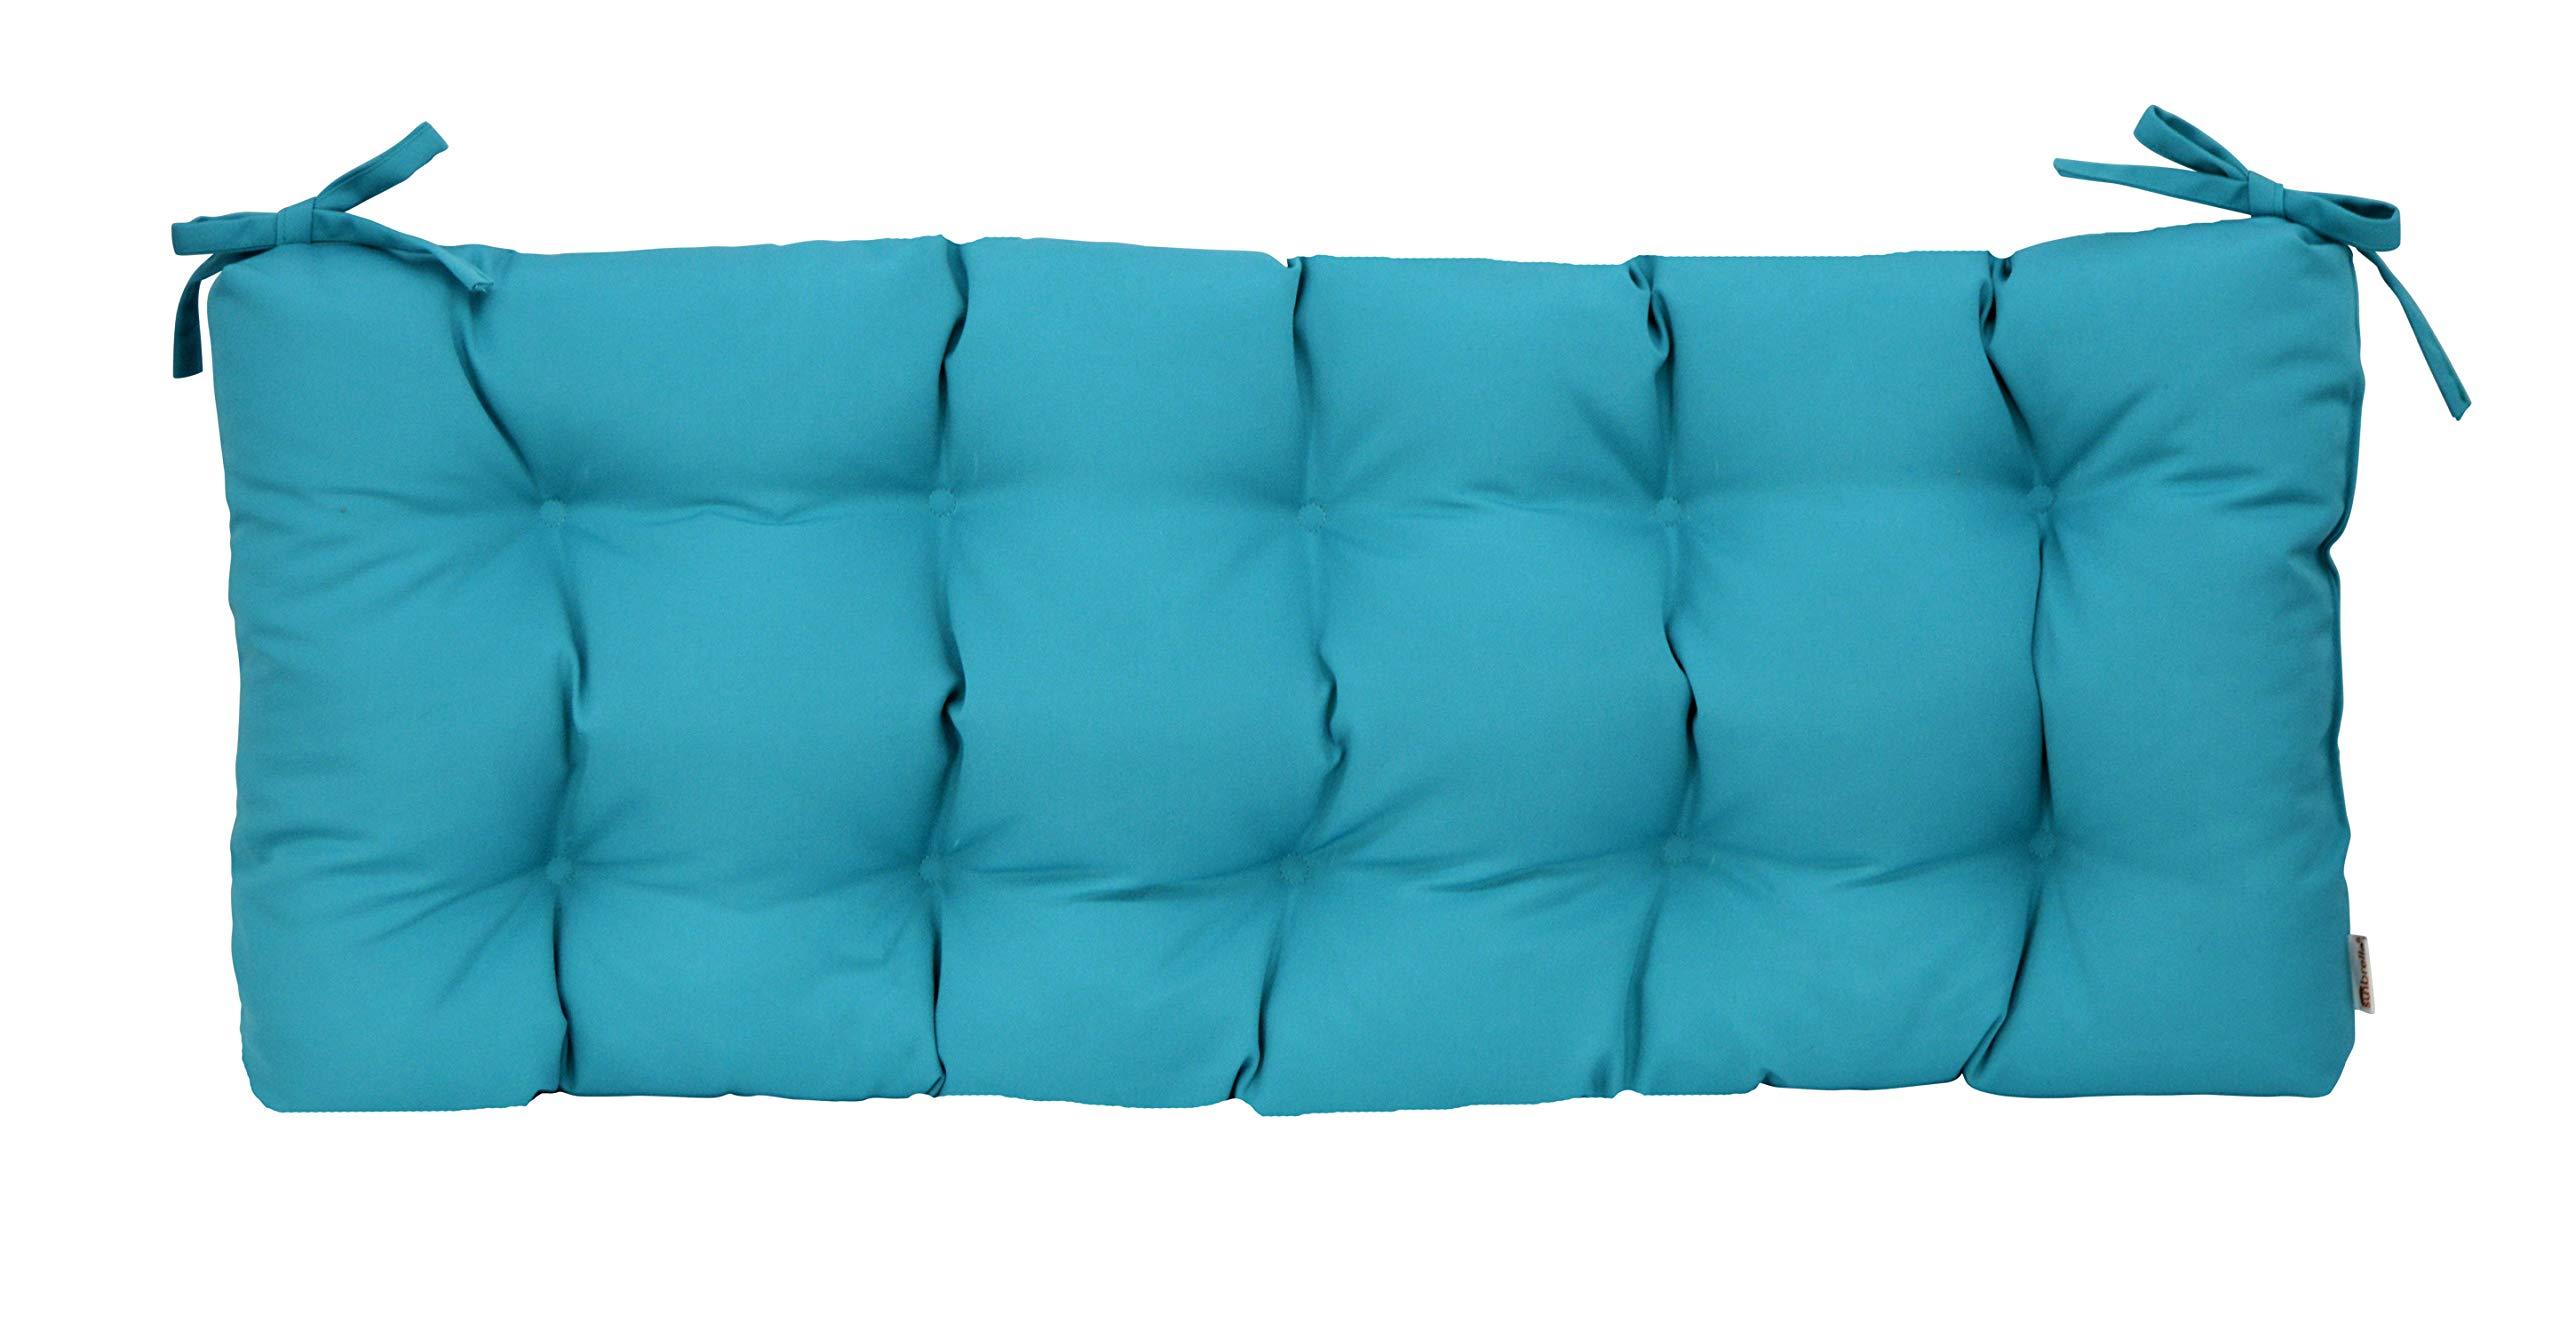 Resort Spa Home Decor Sunbrella Canvas Aruba Blue Teal Indoor/Outdoor Tufted Cushion Ties Bench, Swing, Glider - Choose Size (36'' x 14'')